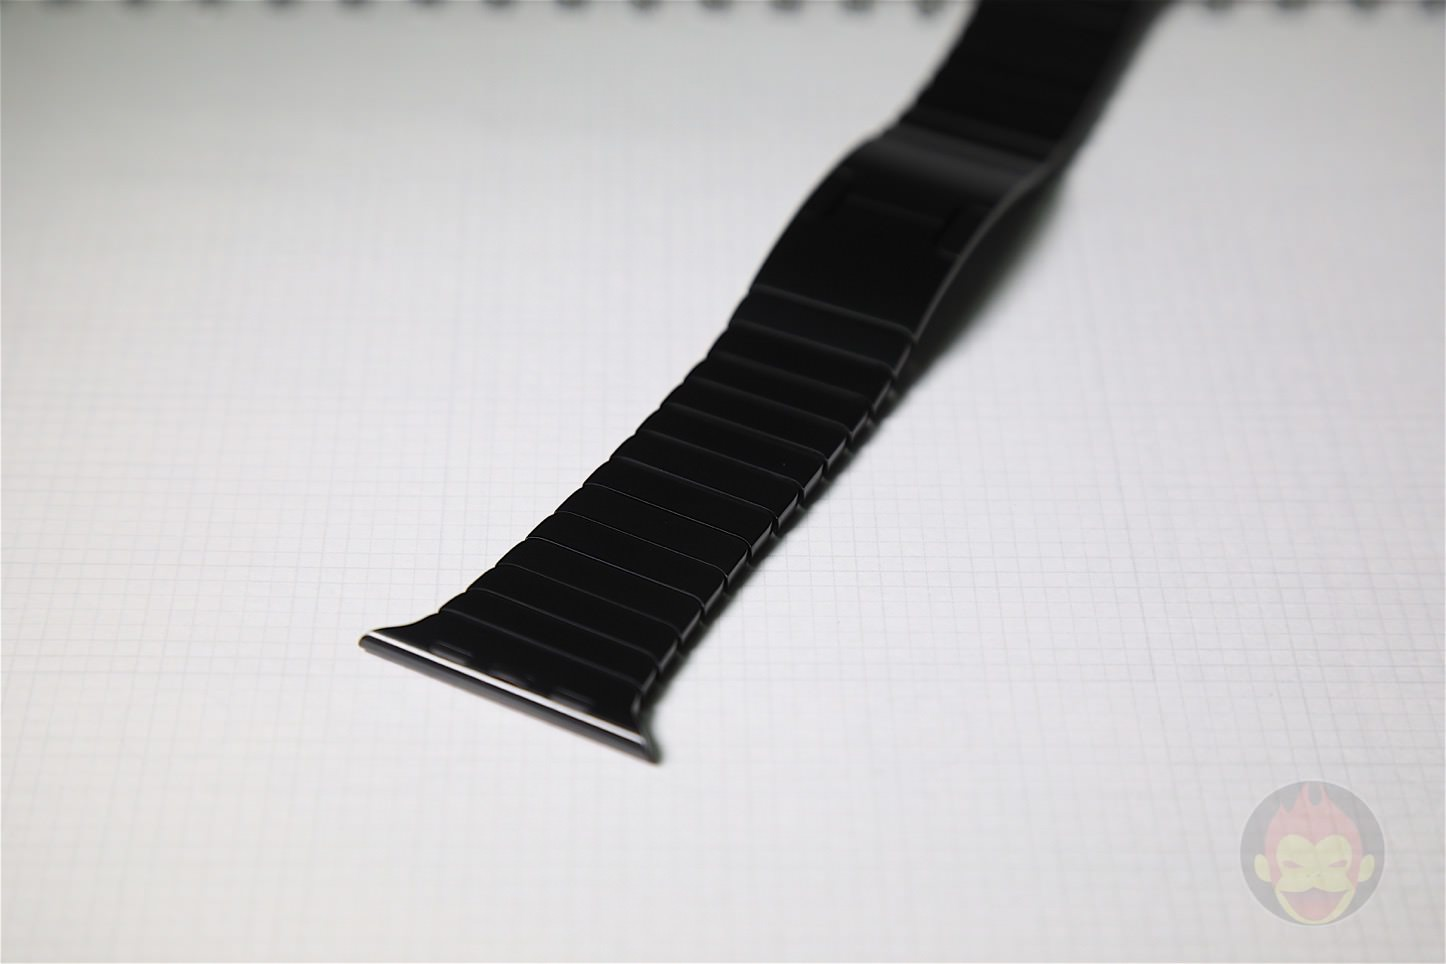 Apple-Link-Bracelet-Black-06.jpg